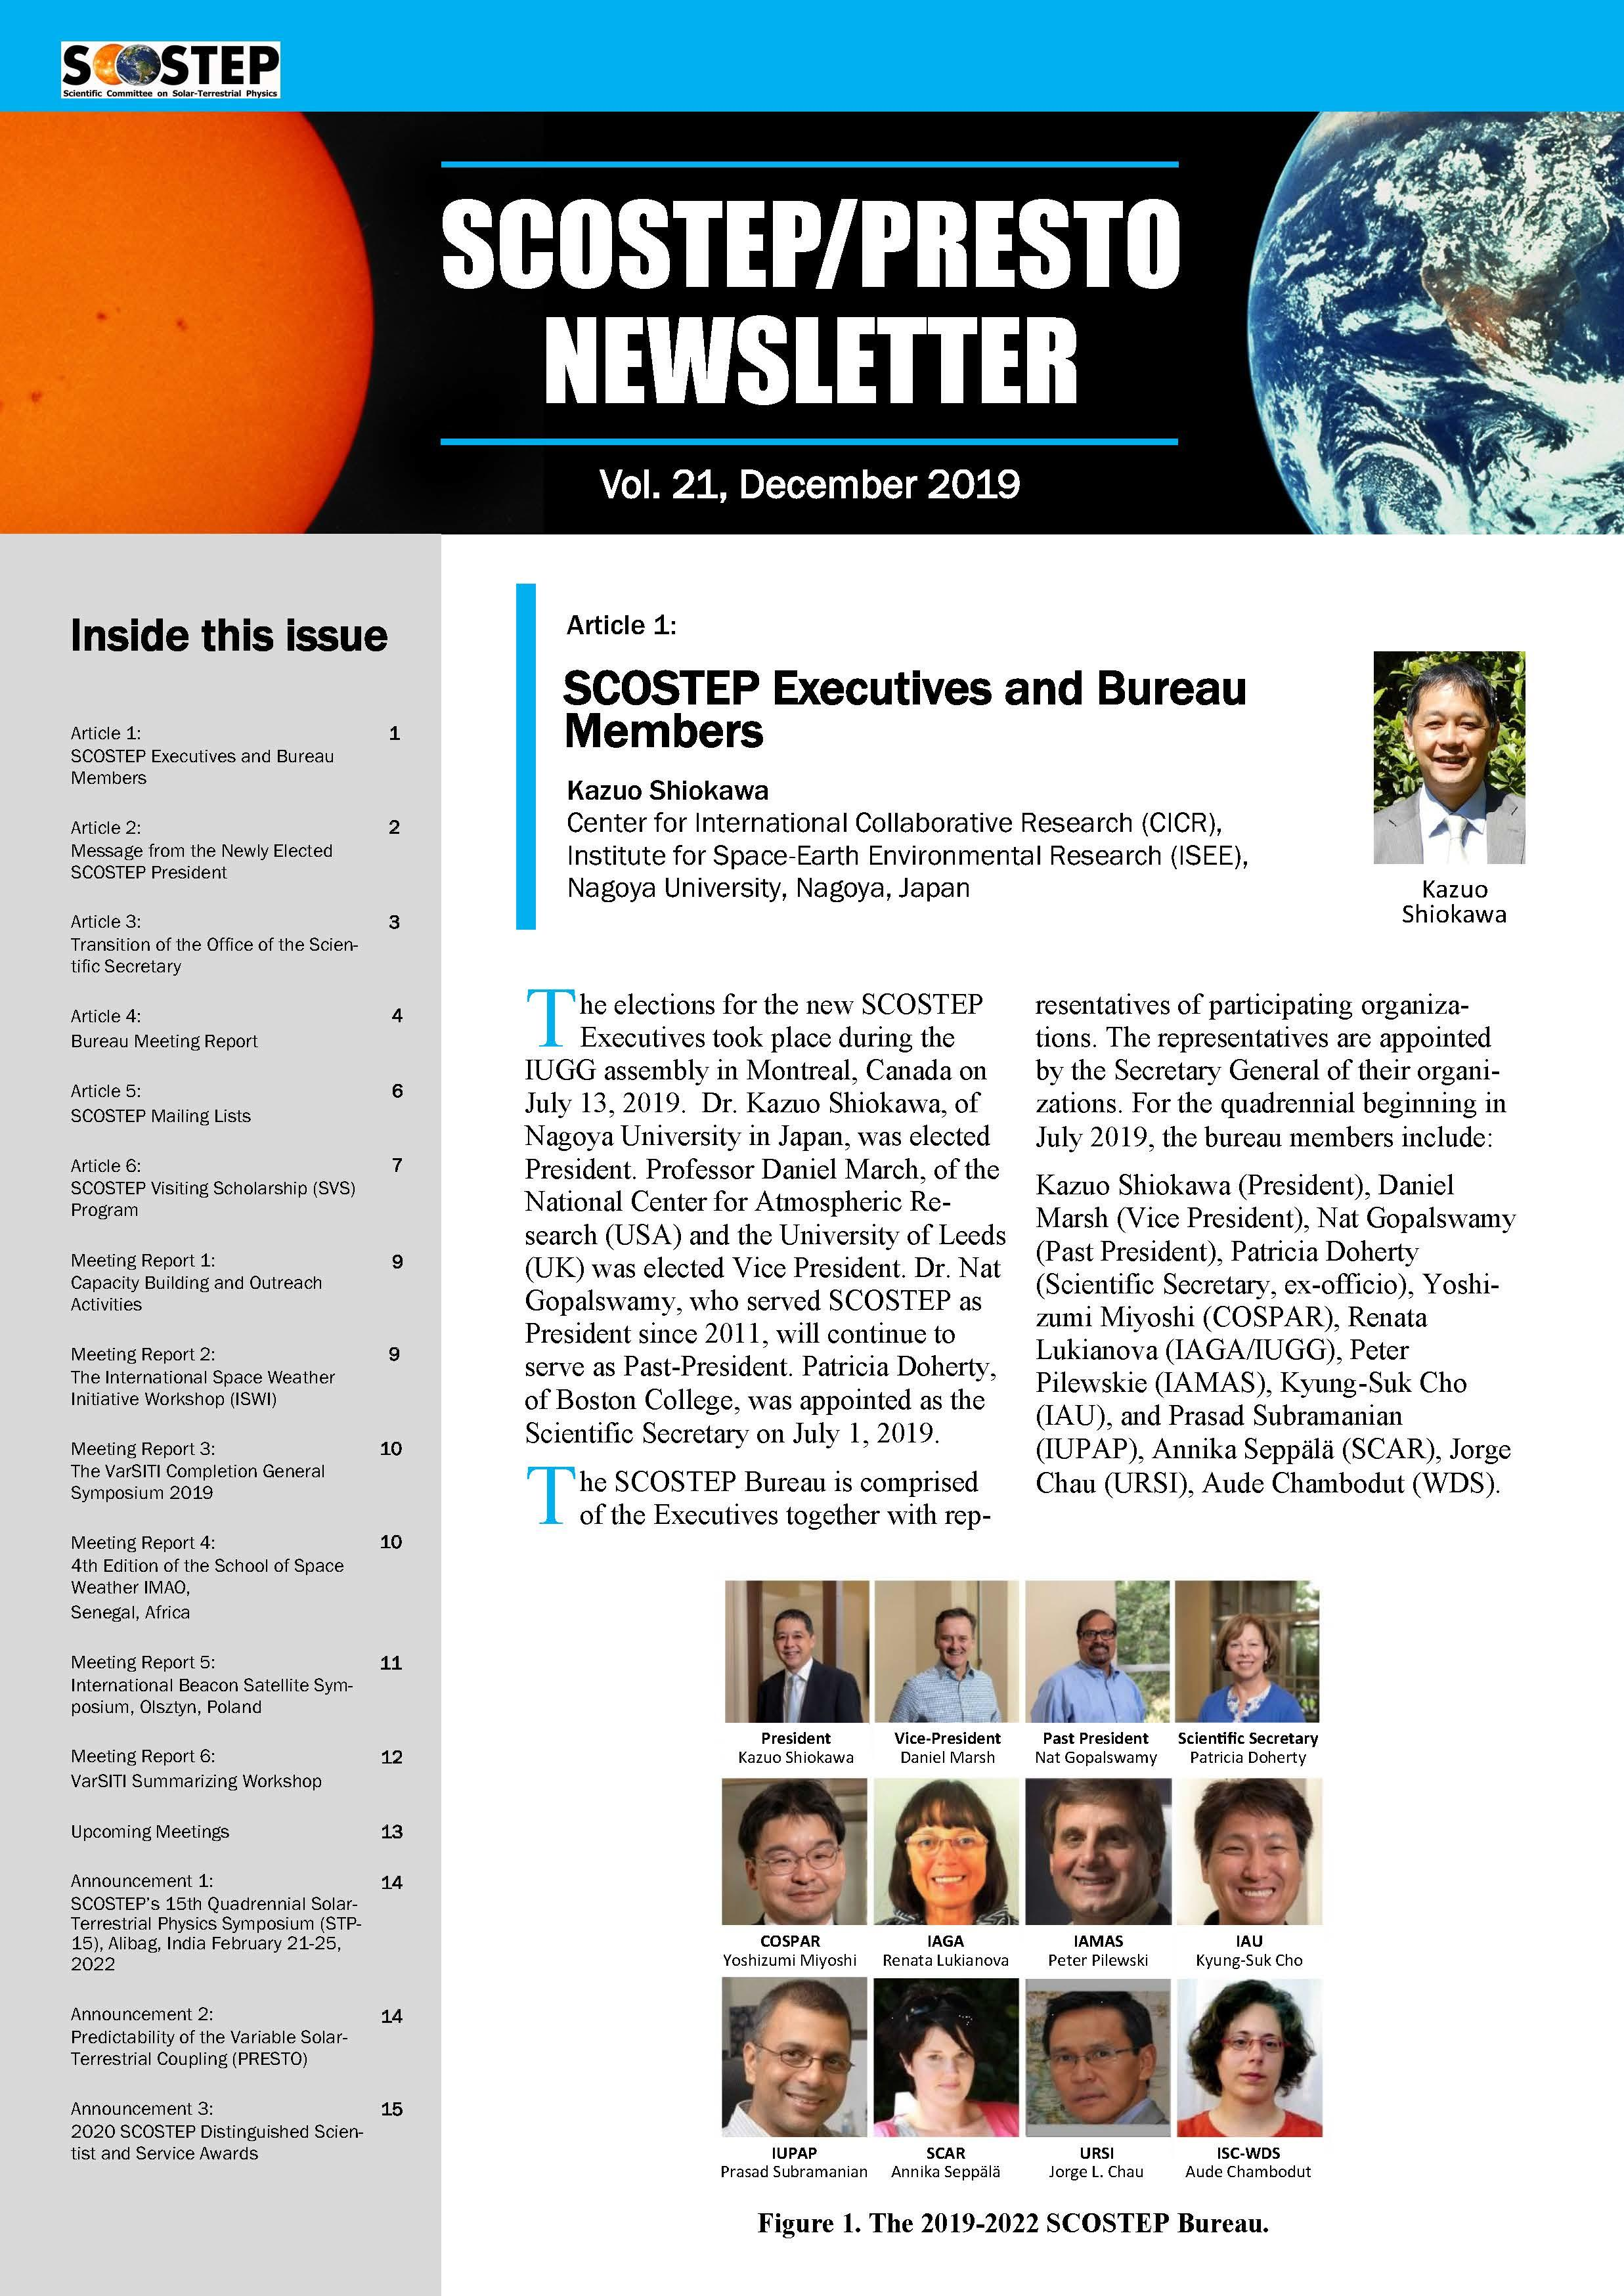 SCOSTEP_PRESTO_Newsletter_Vol21_high_reso_01.jpg